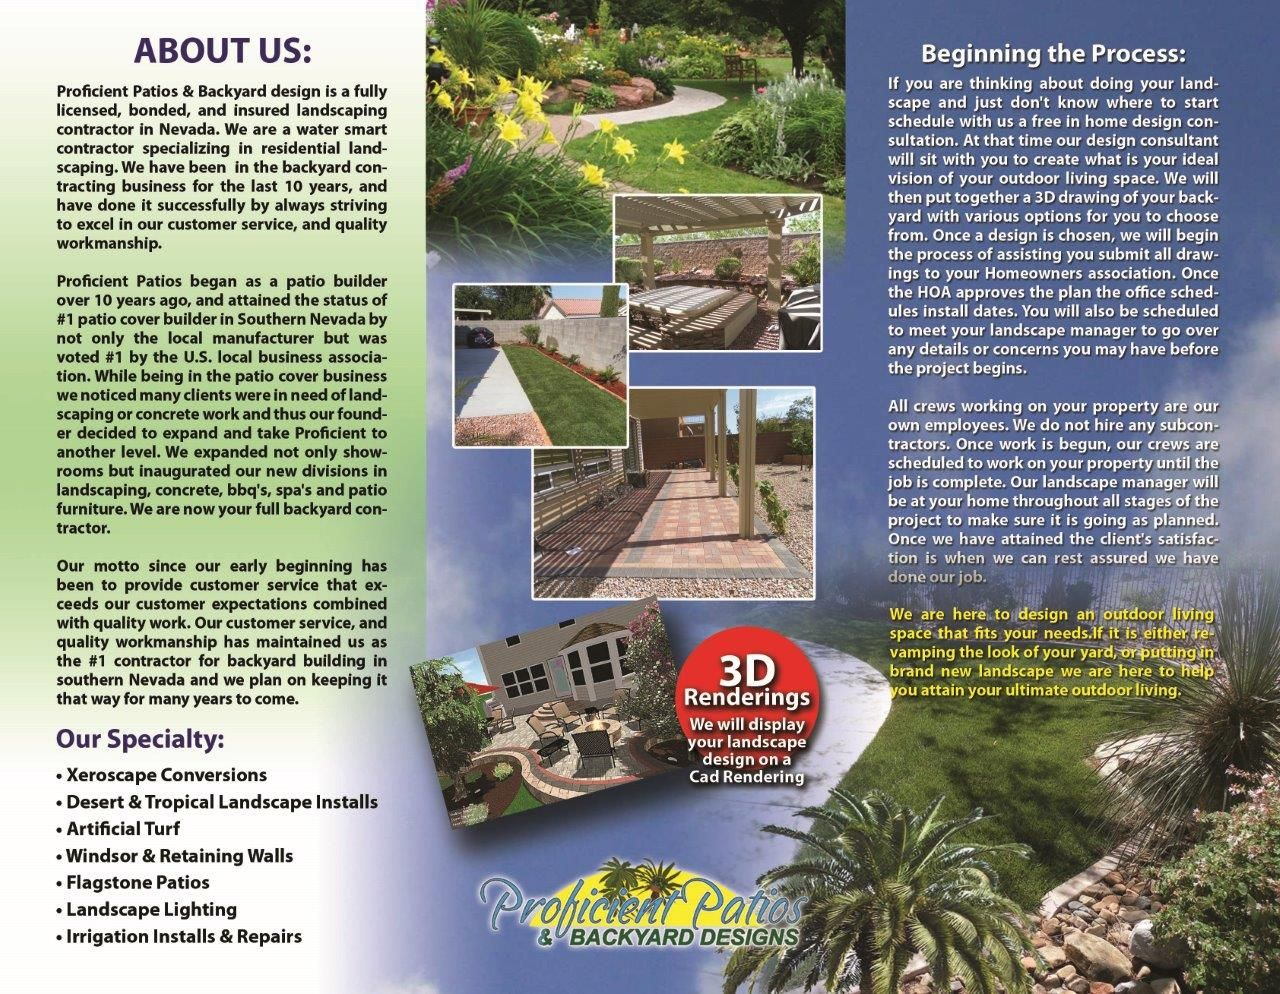 Las Vegas Patio Covers Brochure Design | Landscaping Advertisers ...